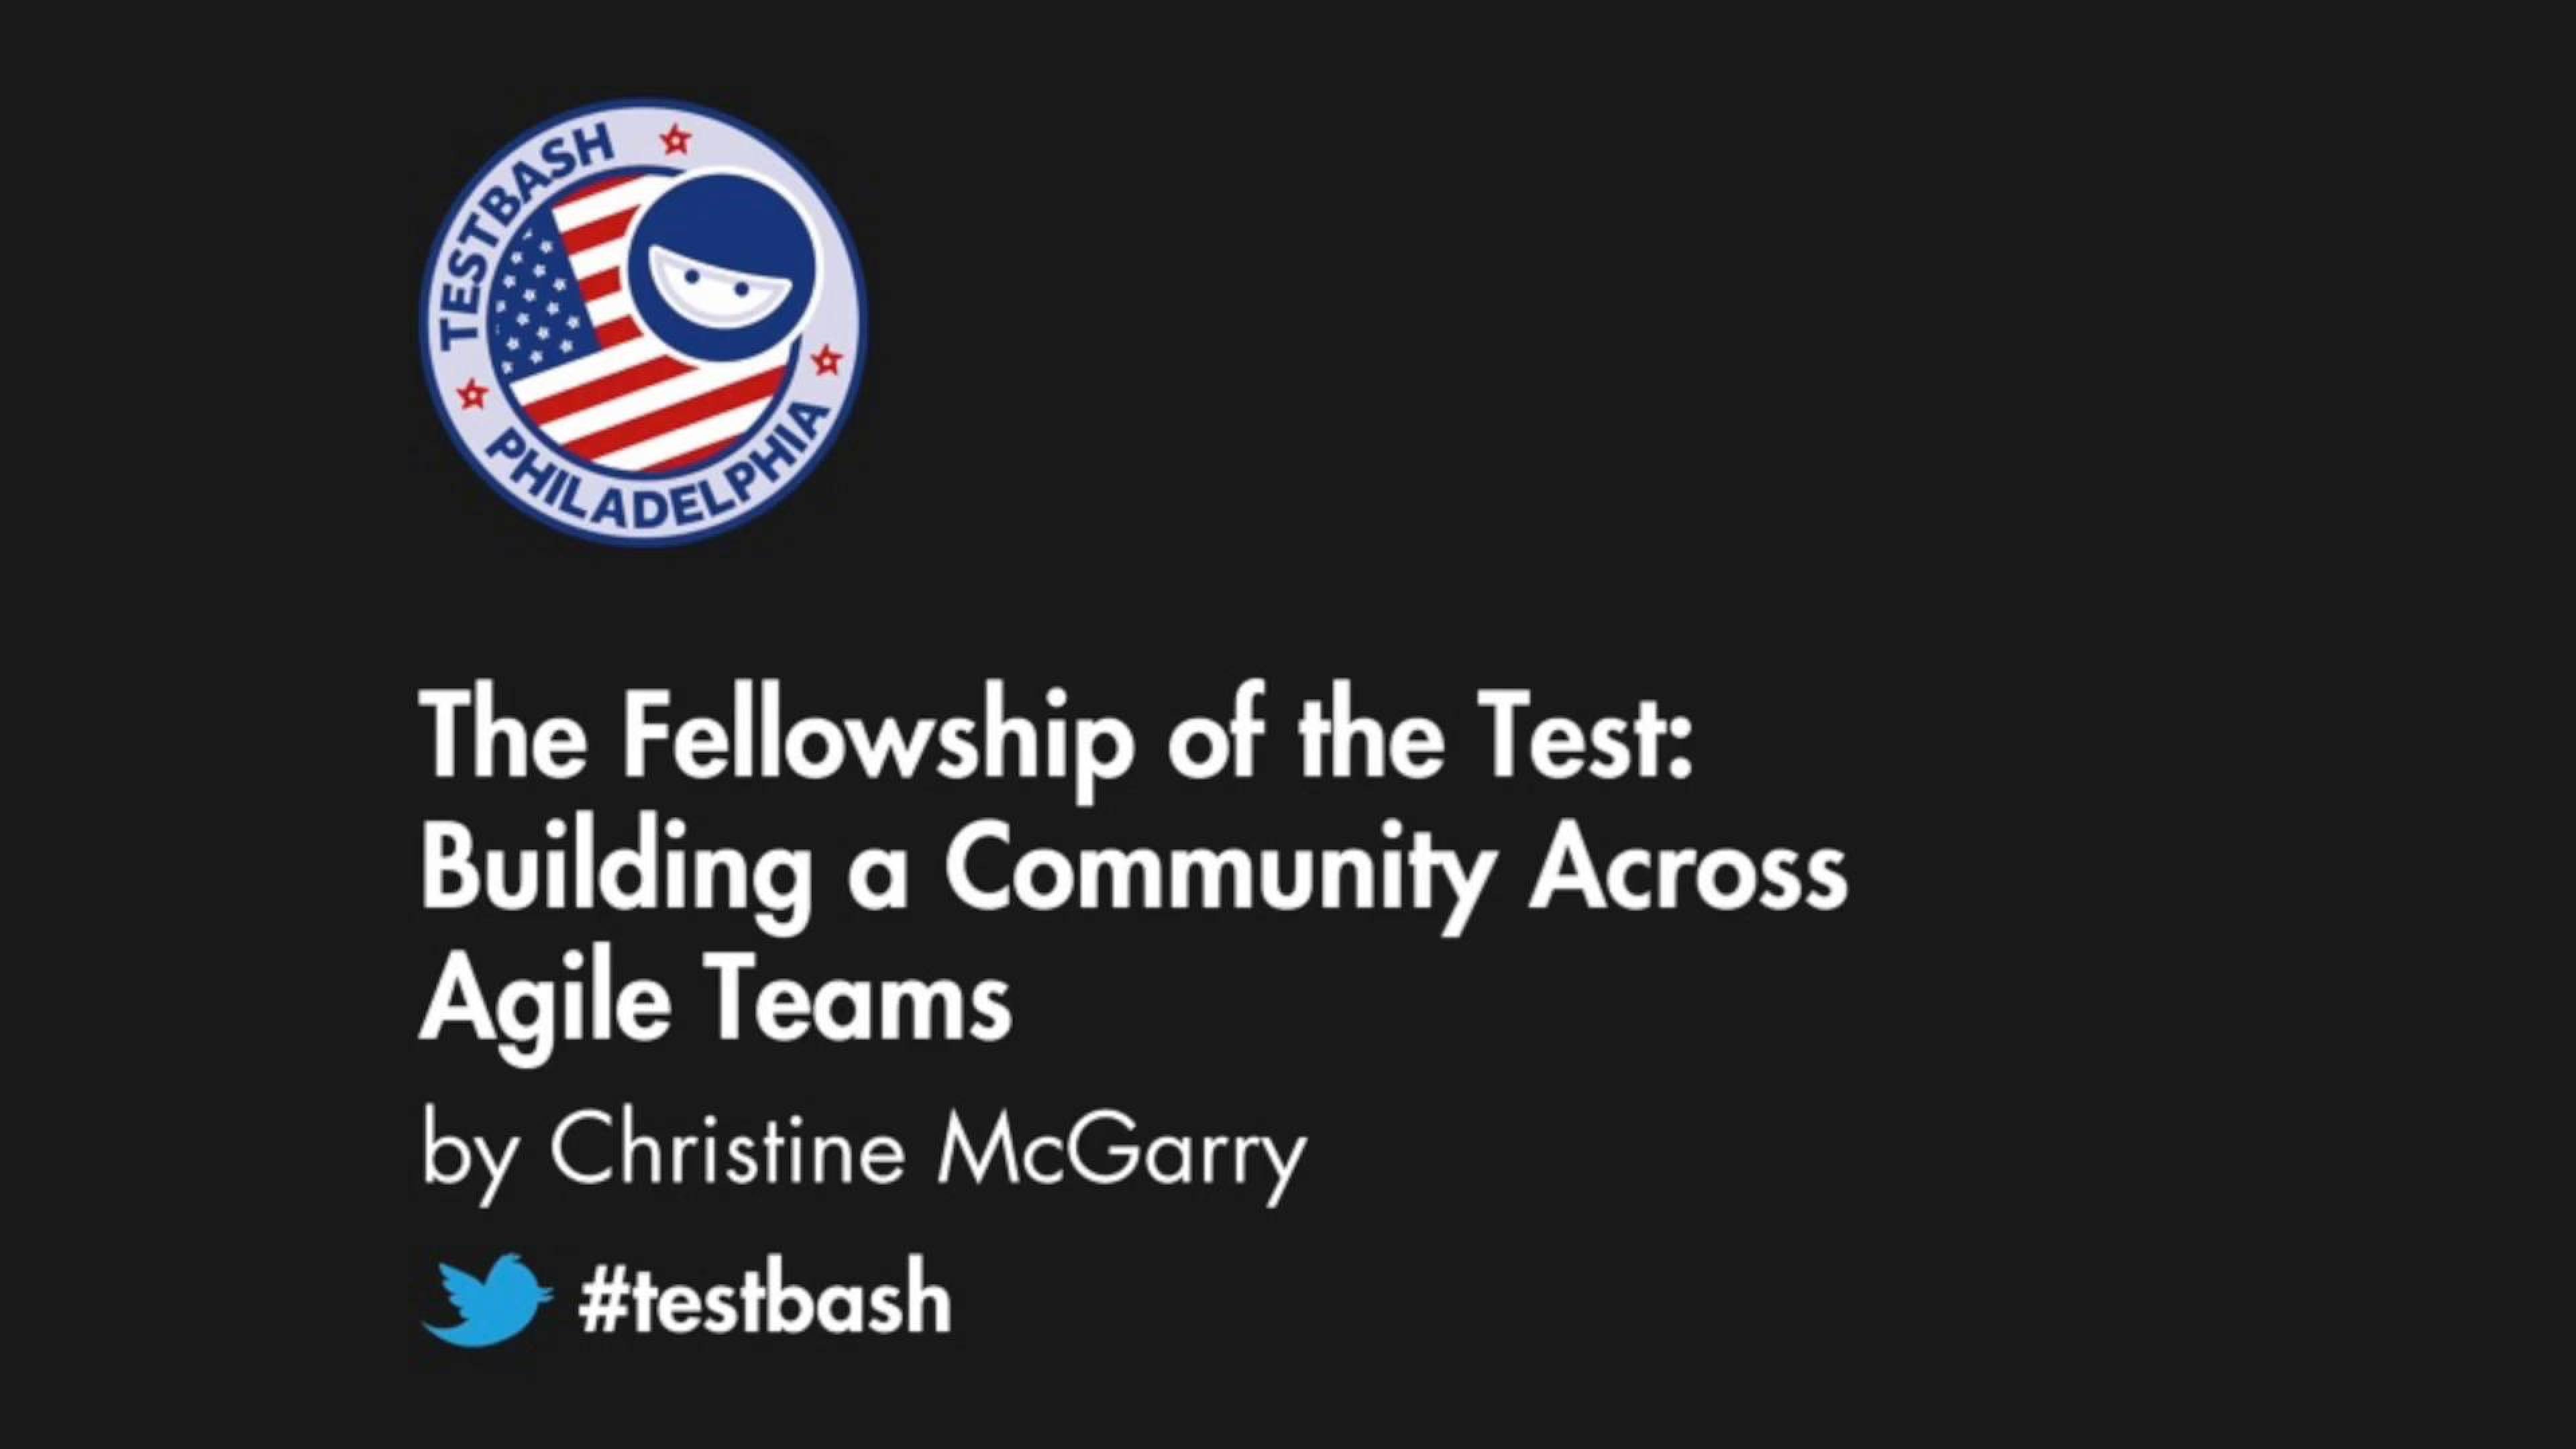 The Fellowship of the Test: Building a Community Across Agile Teams - Christine McGarry